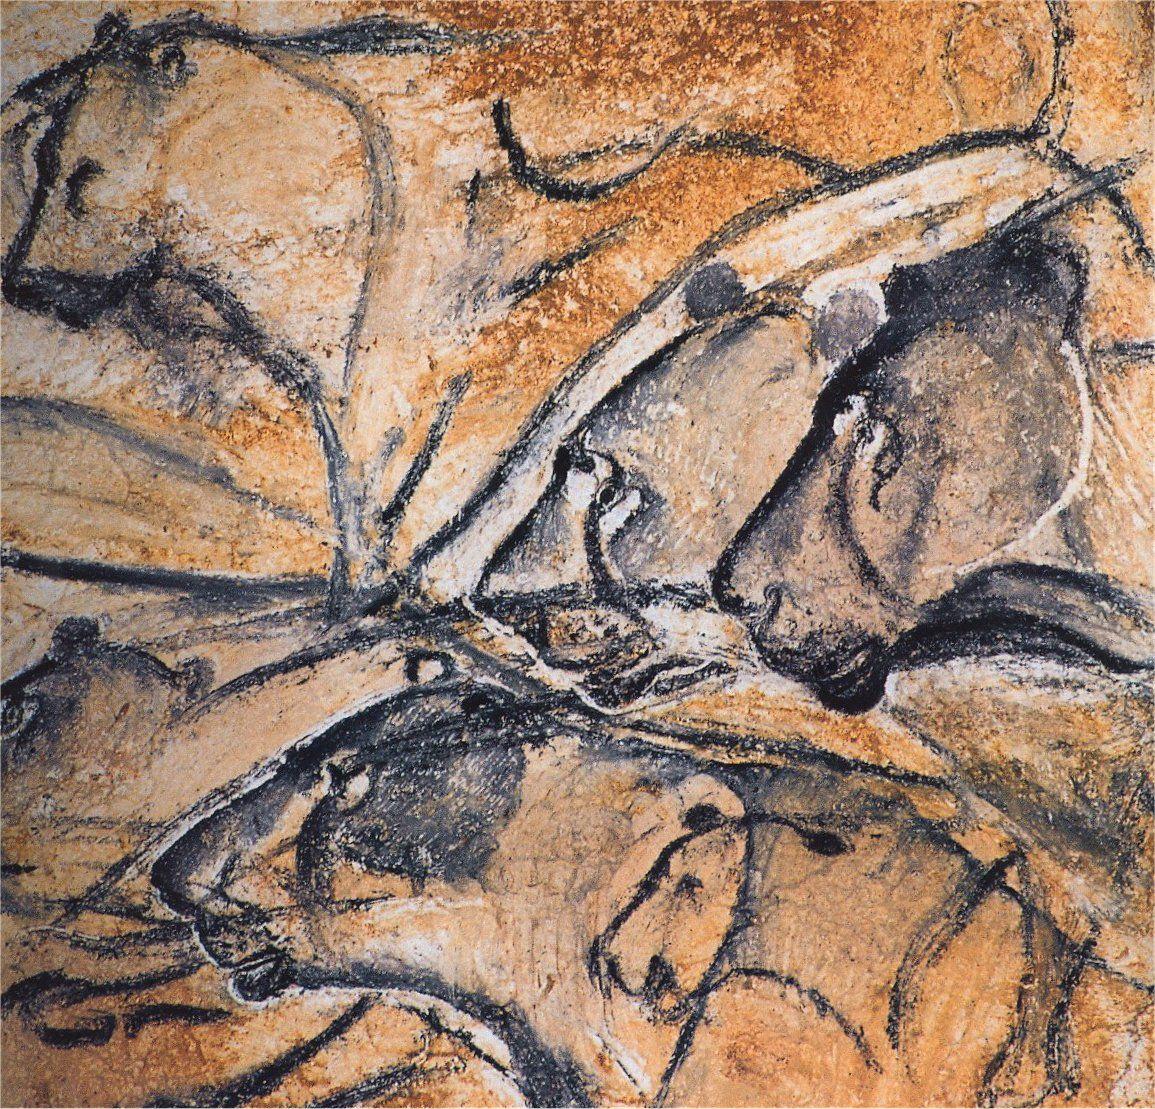 The art of Chauvet cave Bac850f48cb26b8f367e7e0c9f44f010